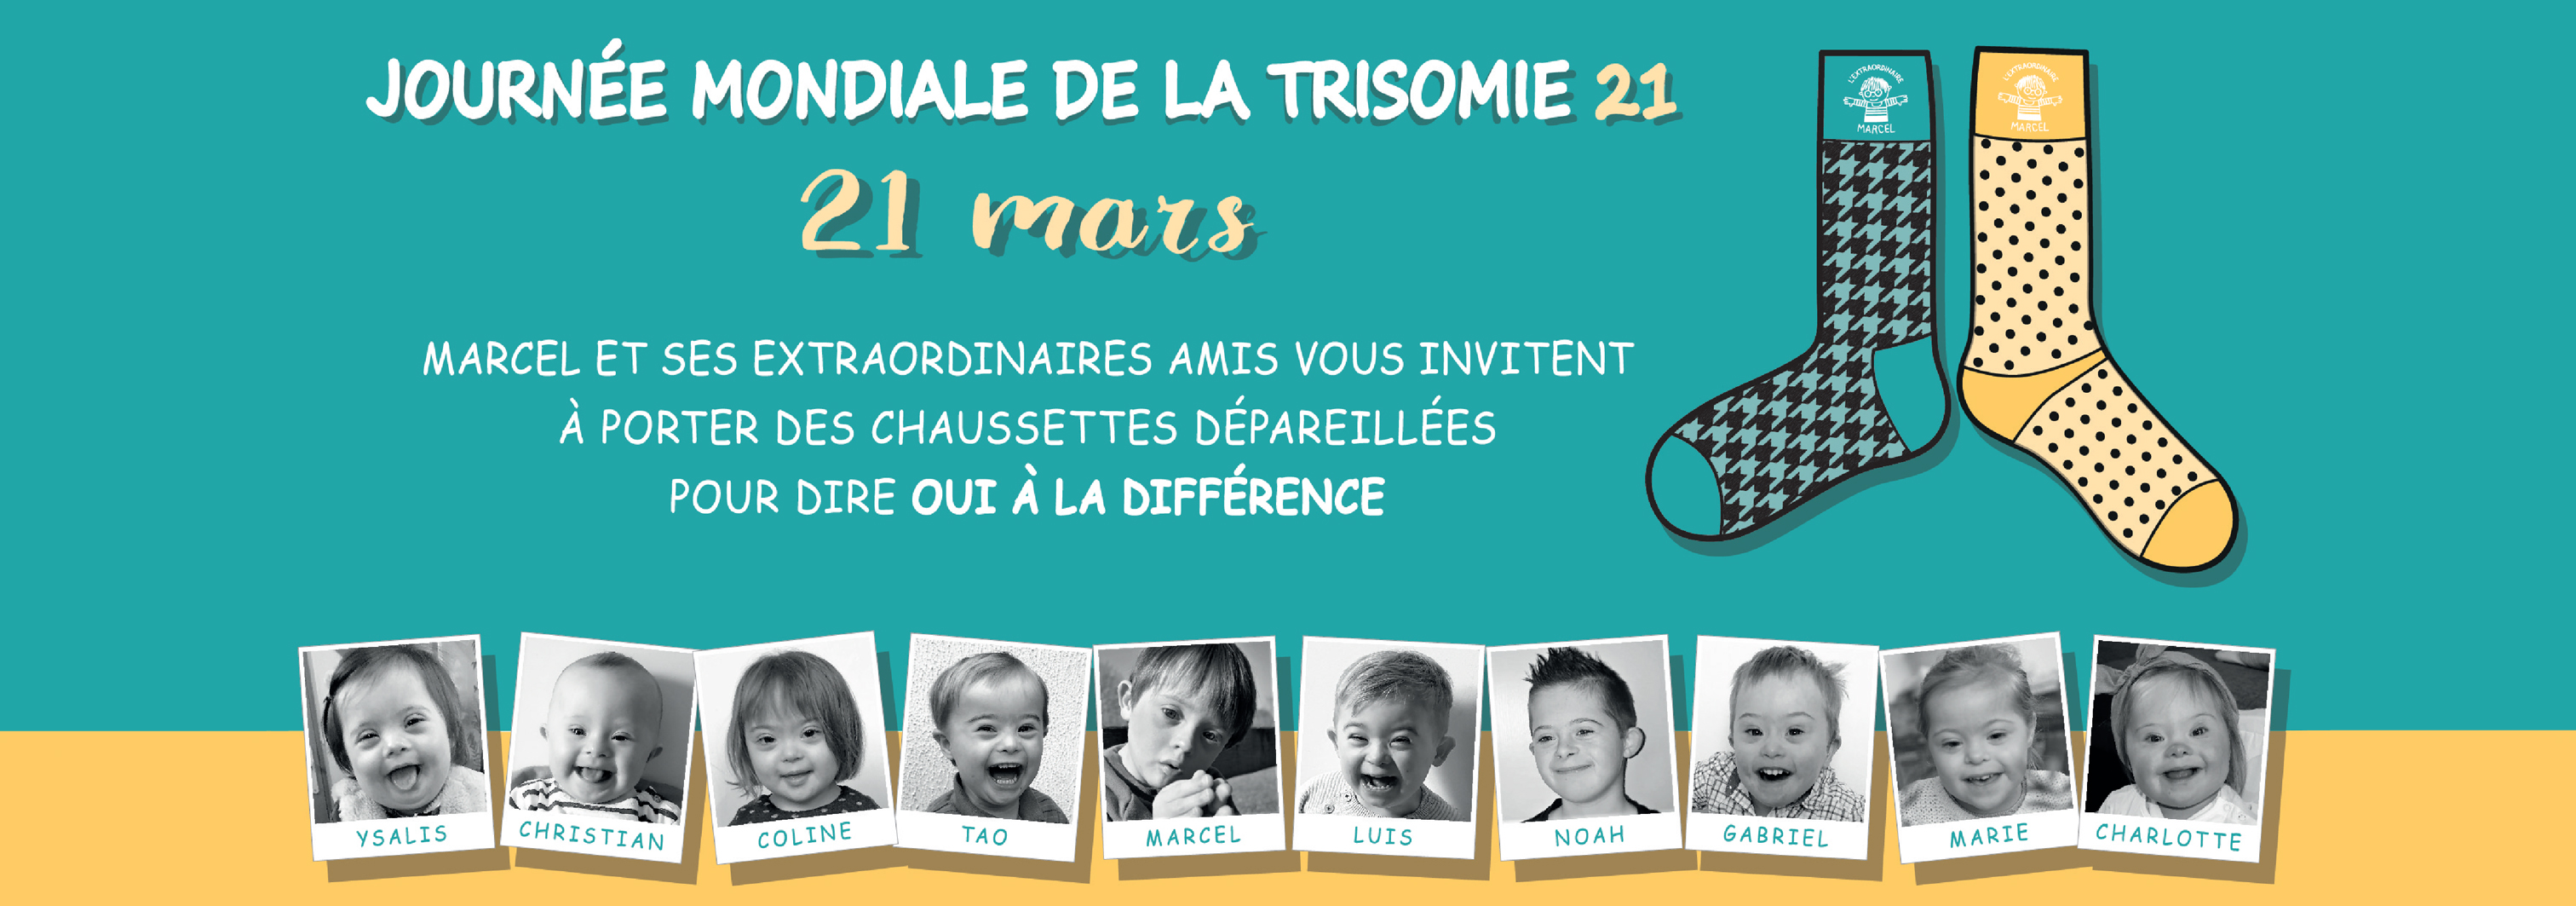 journée mondiale trisomie 21 bis.jpg